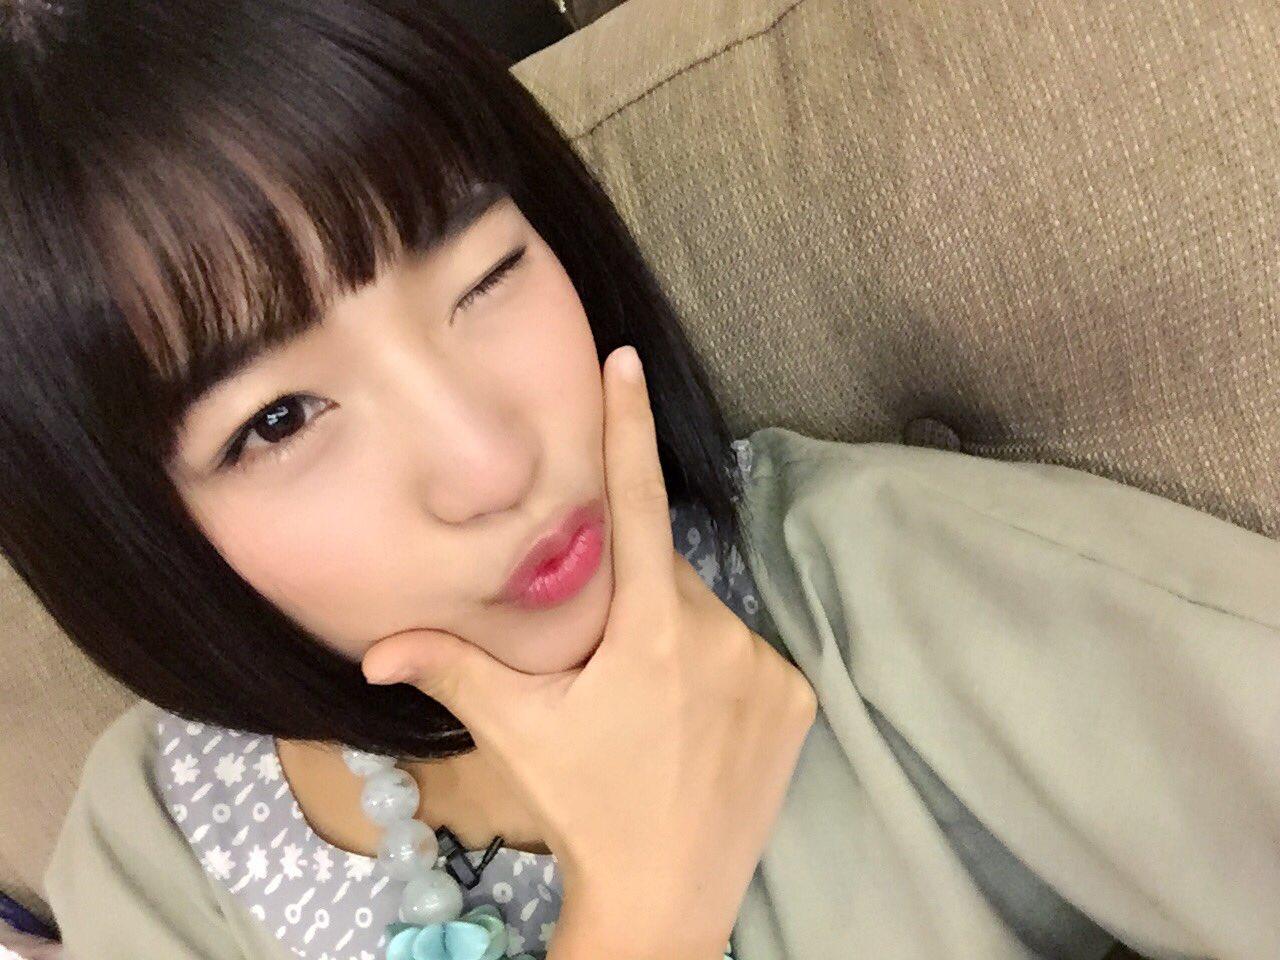 "Haruka Nakagawa: Haruka Nakagawa 仲川遥香 On Twitter: ""Yuk Bangun Yuk😆 Bentar"